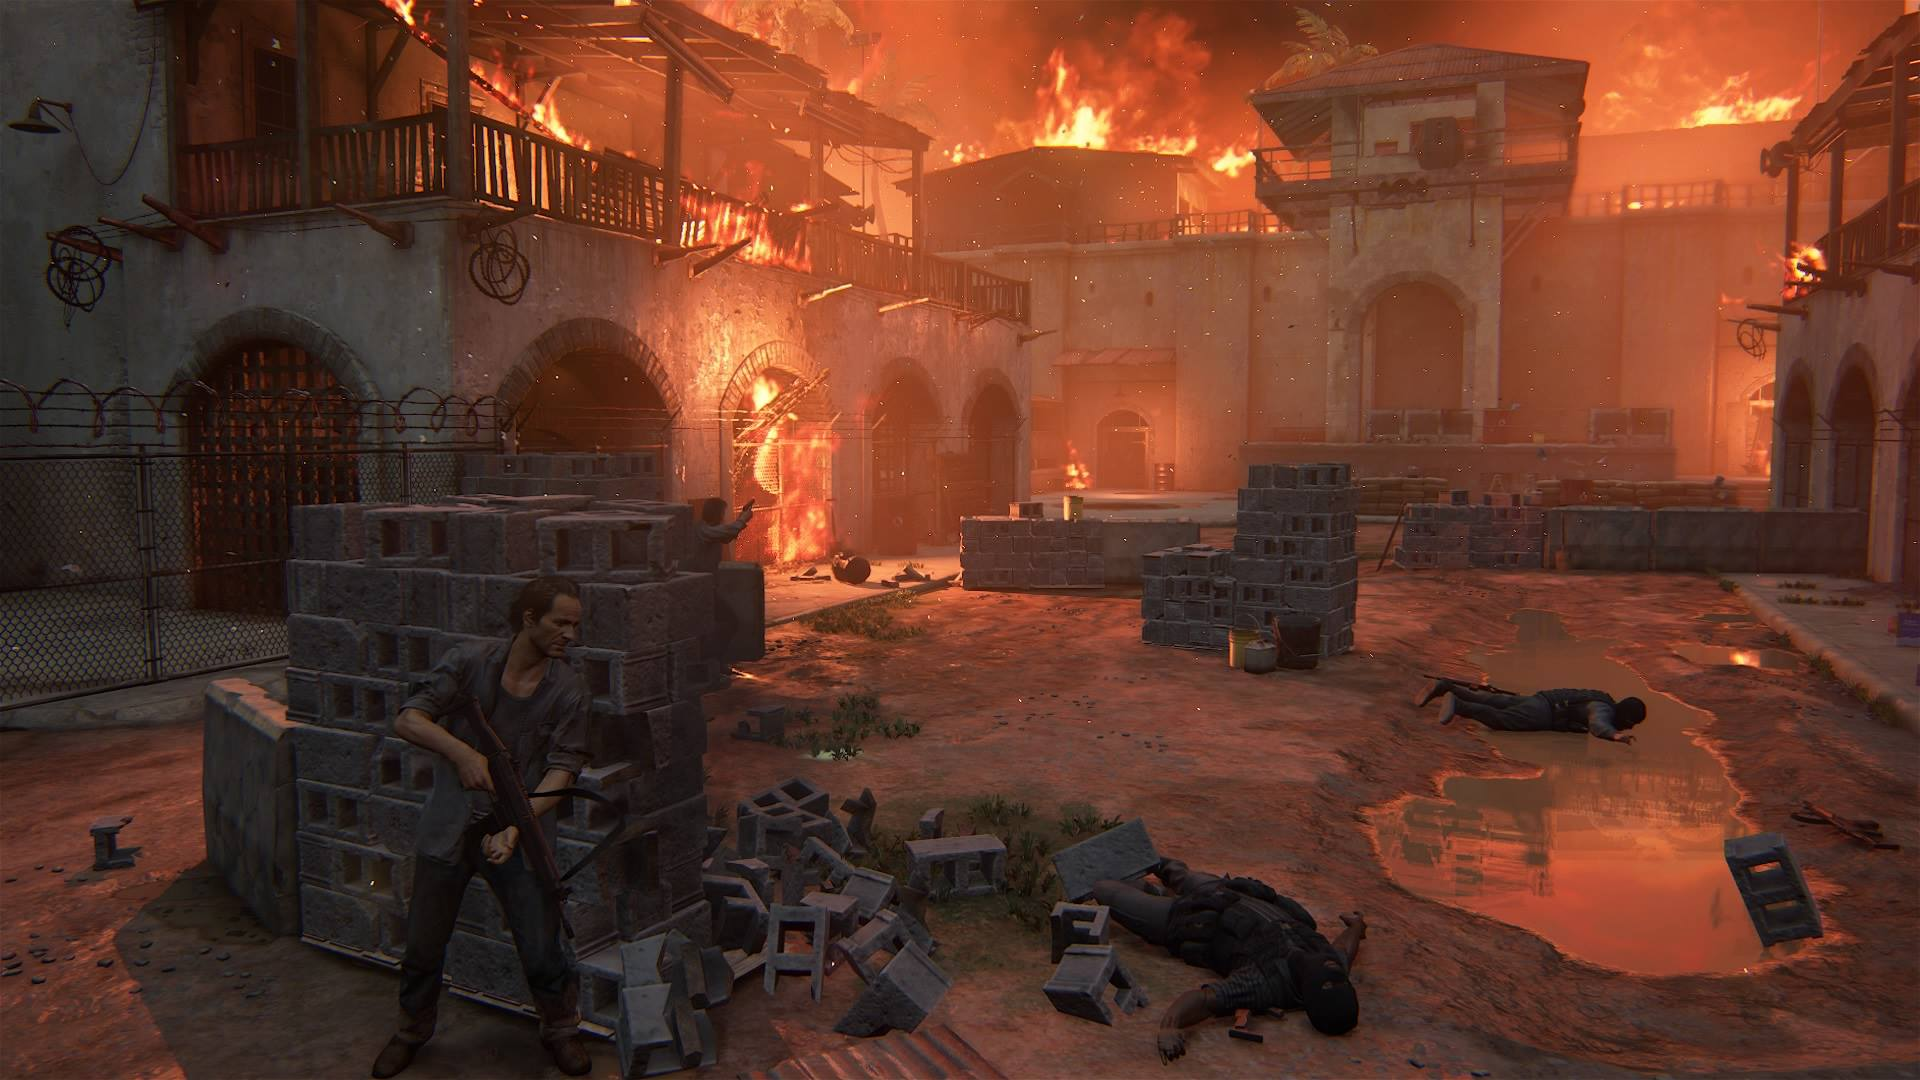 Новостища найн! Коллекционки Titanfall 2!  PS4K реальна ! Трейлер Call of Ctulhu!. - Изображение 1